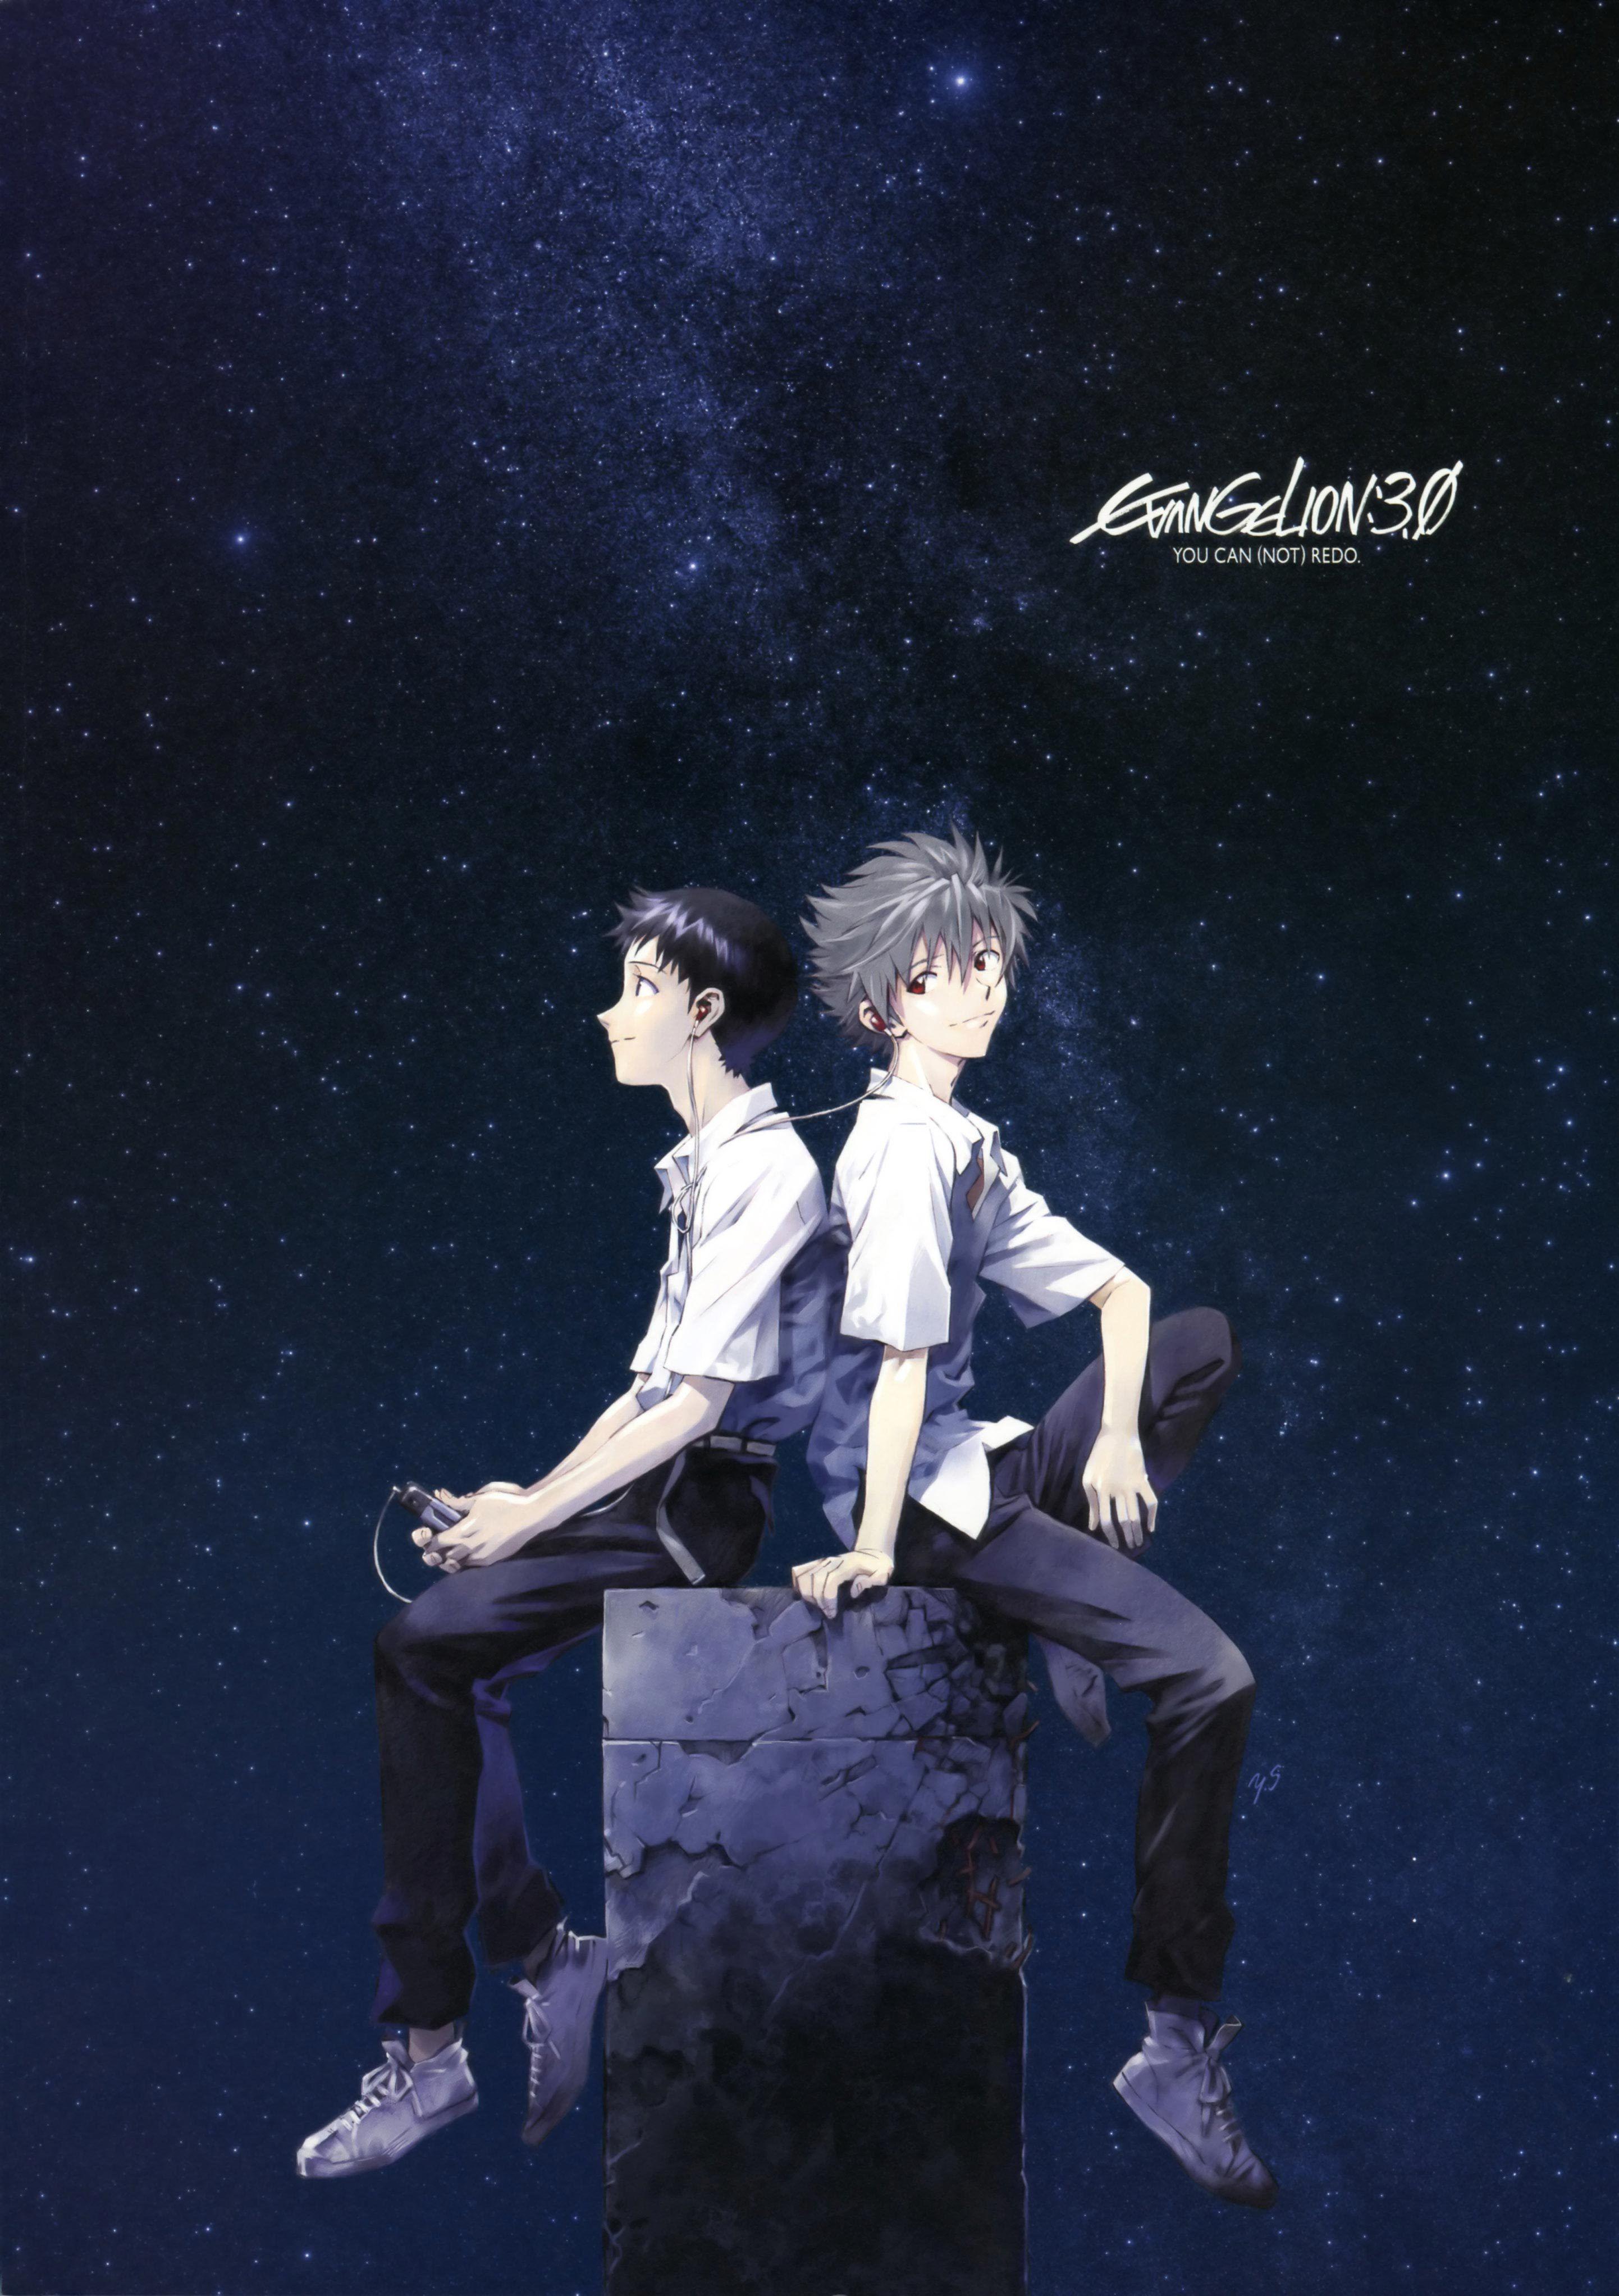 Evangelion 3.0 : You Can (Not) Redo - Long-métrage d'animation (2012)